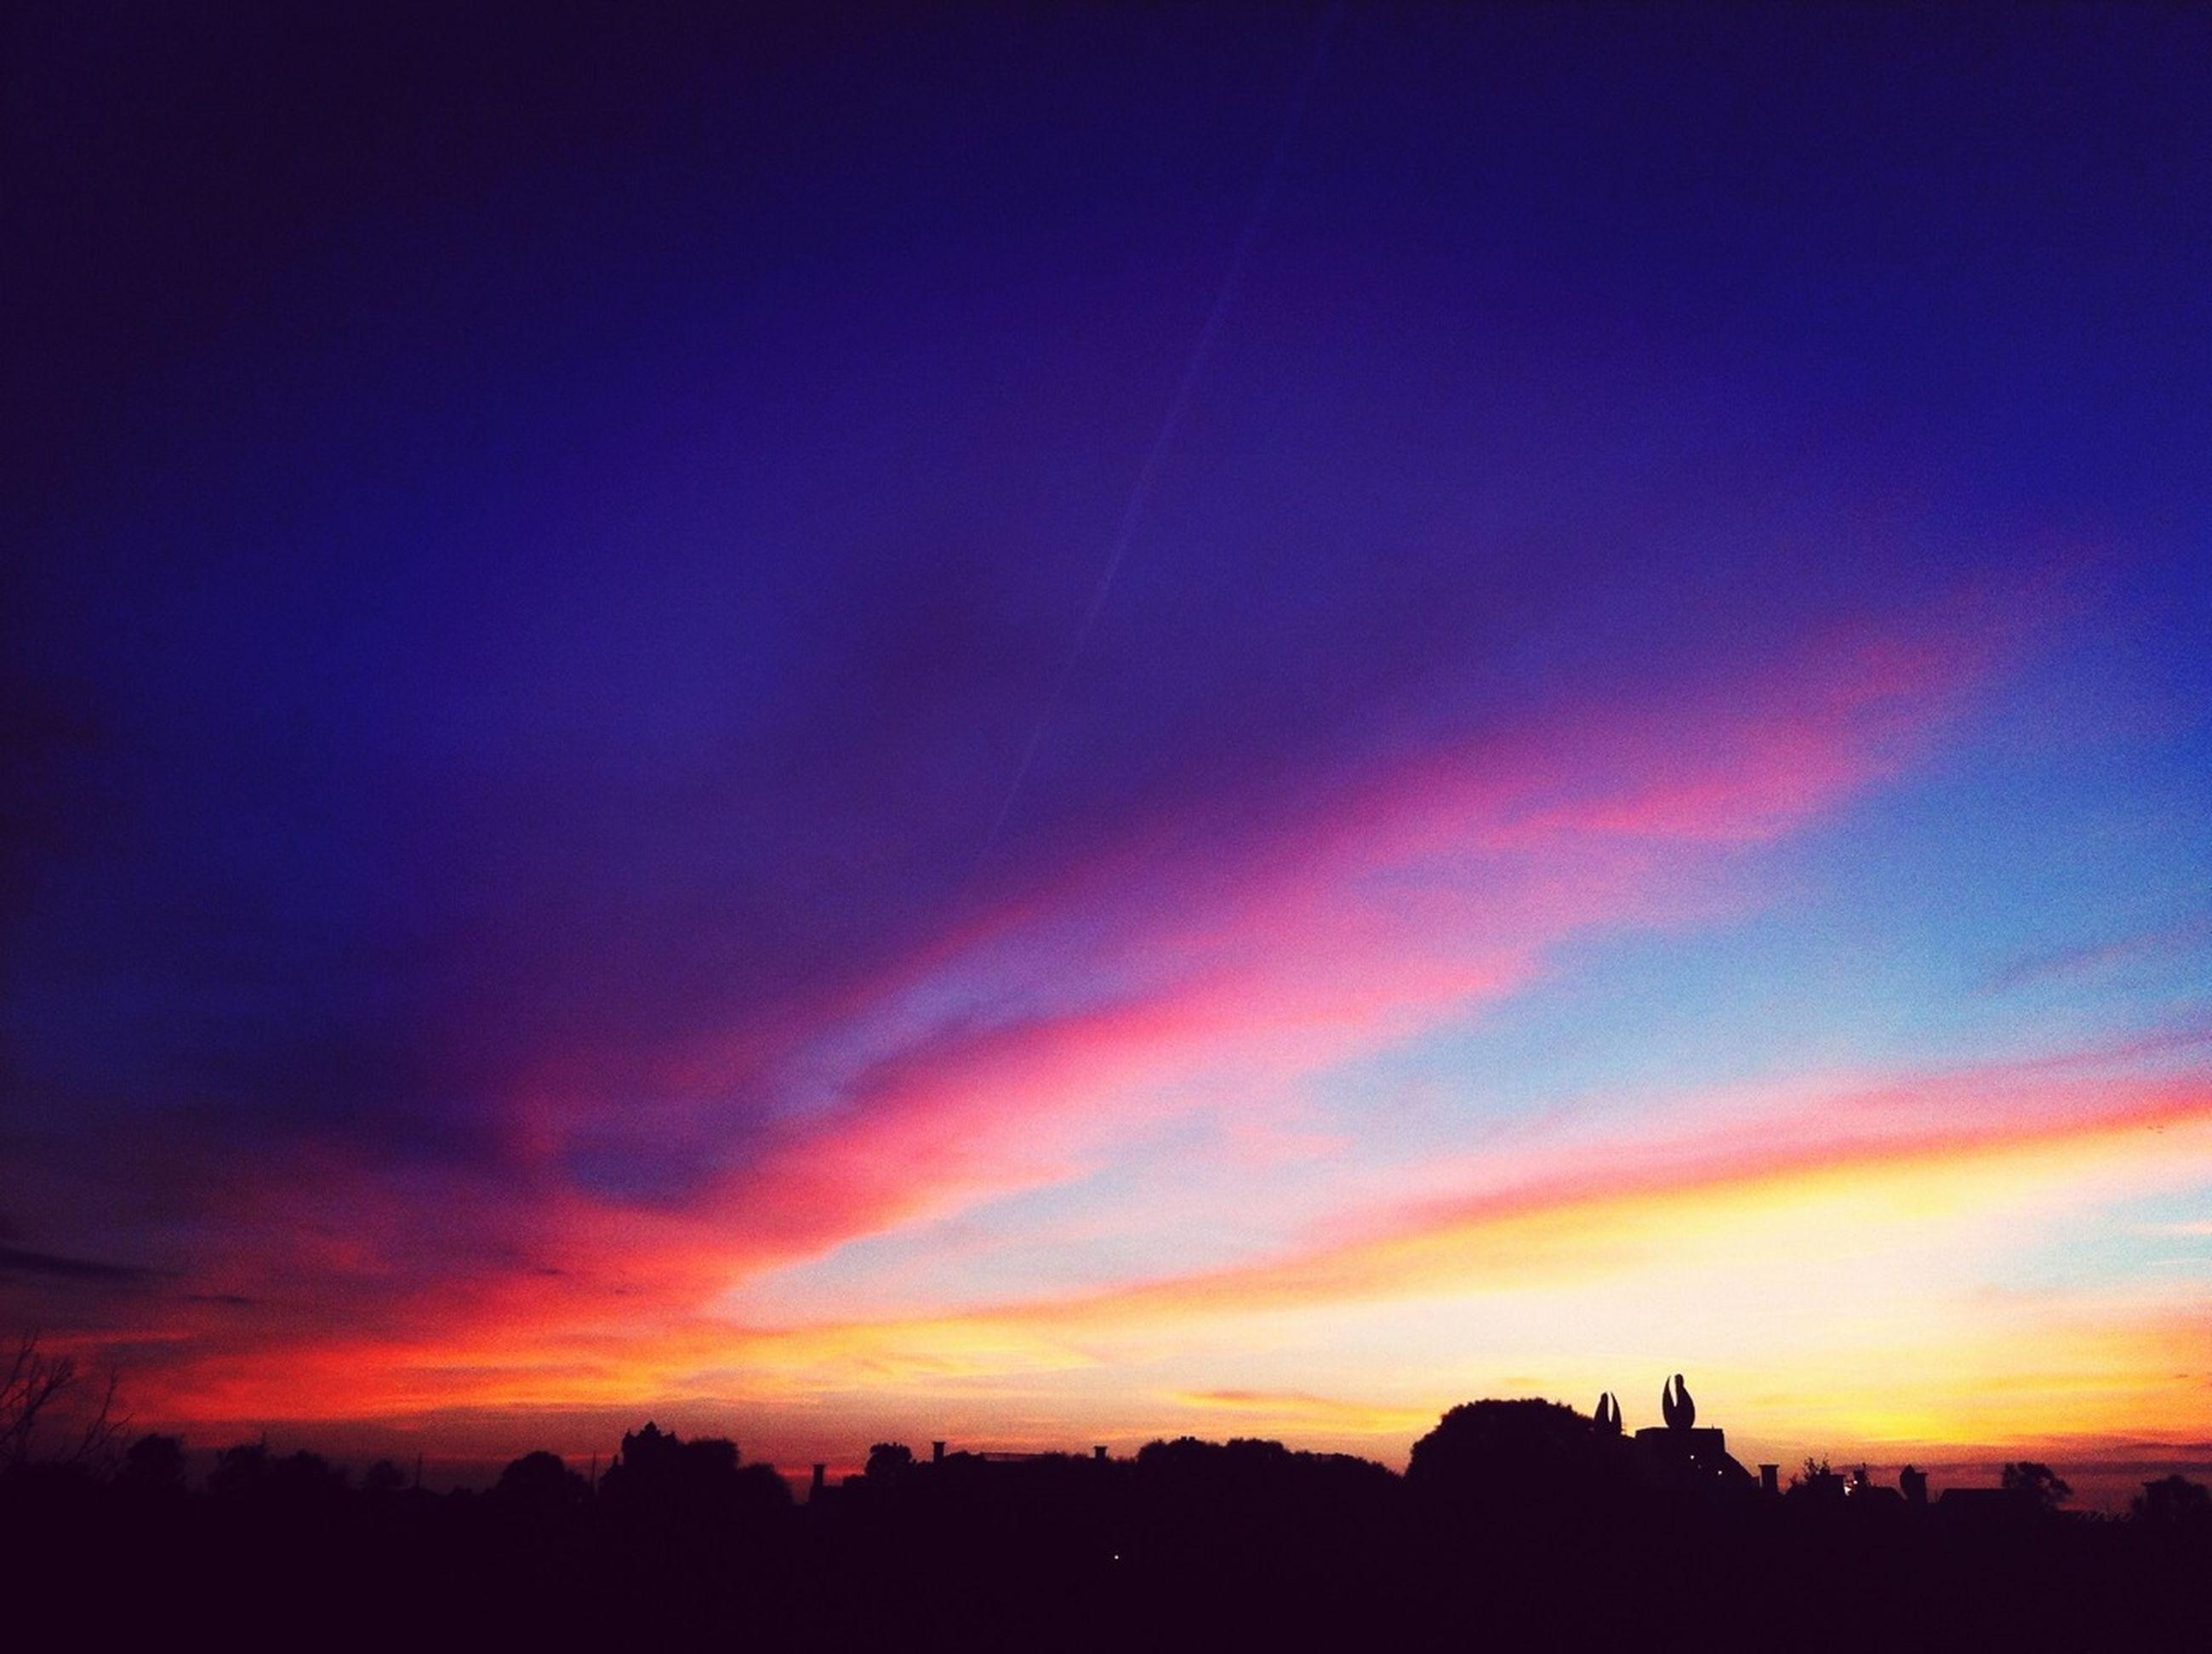 sunset, silhouette, scenics, beauty in nature, sky, tranquil scene, tranquility, orange color, nature, idyllic, dramatic sky, tree, landscape, cloud - sky, dusk, blue, cloud, majestic, dark, outdoors